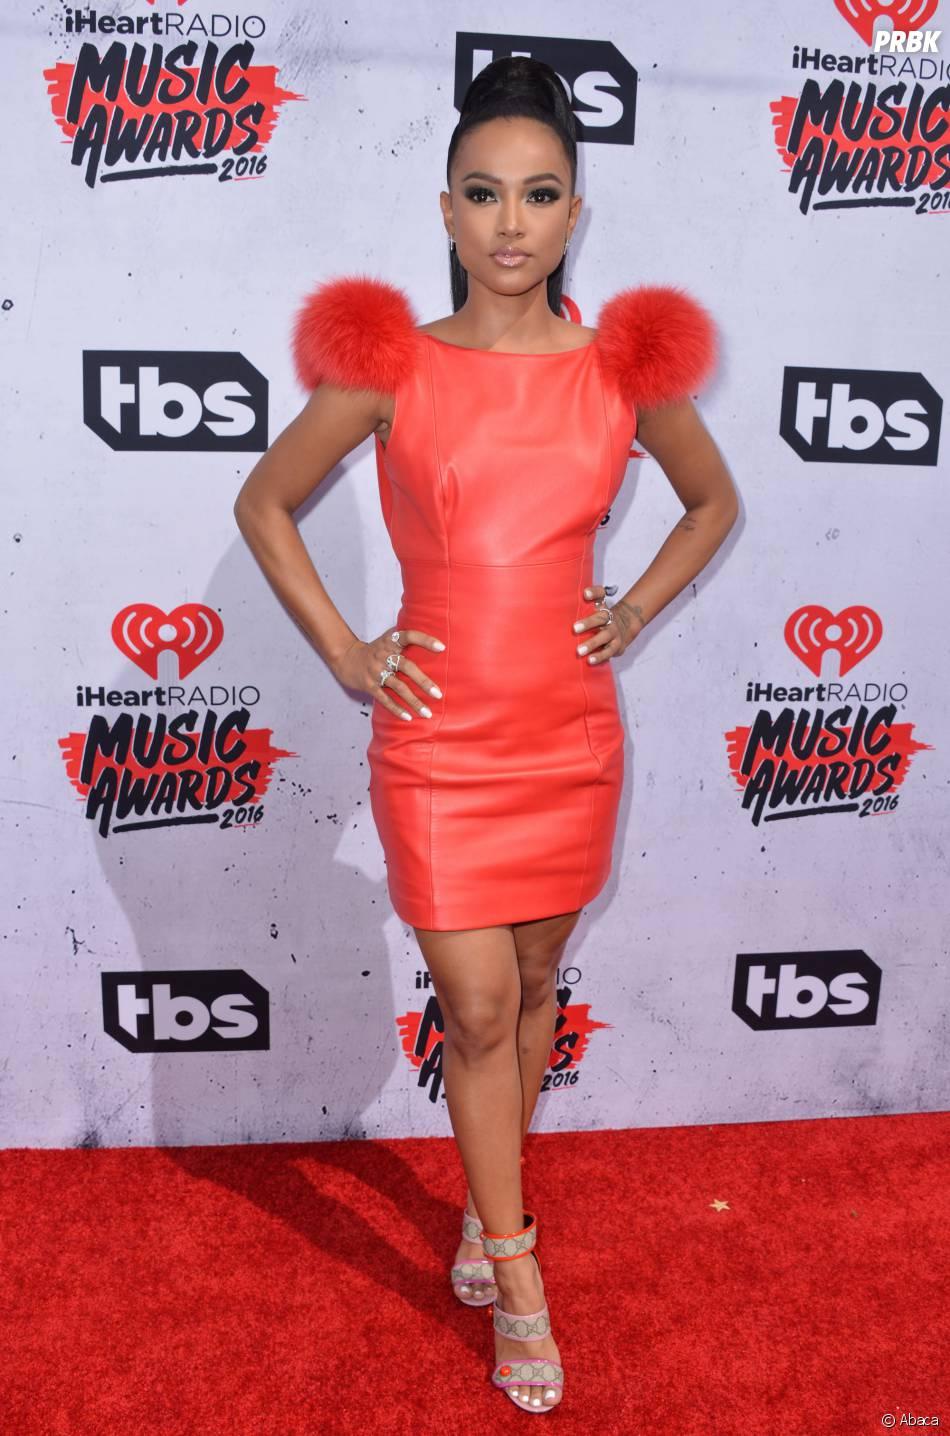 Karrueche Tran aux iHeartRadio Music Awards 2016 le 3 avril à Los Angeles